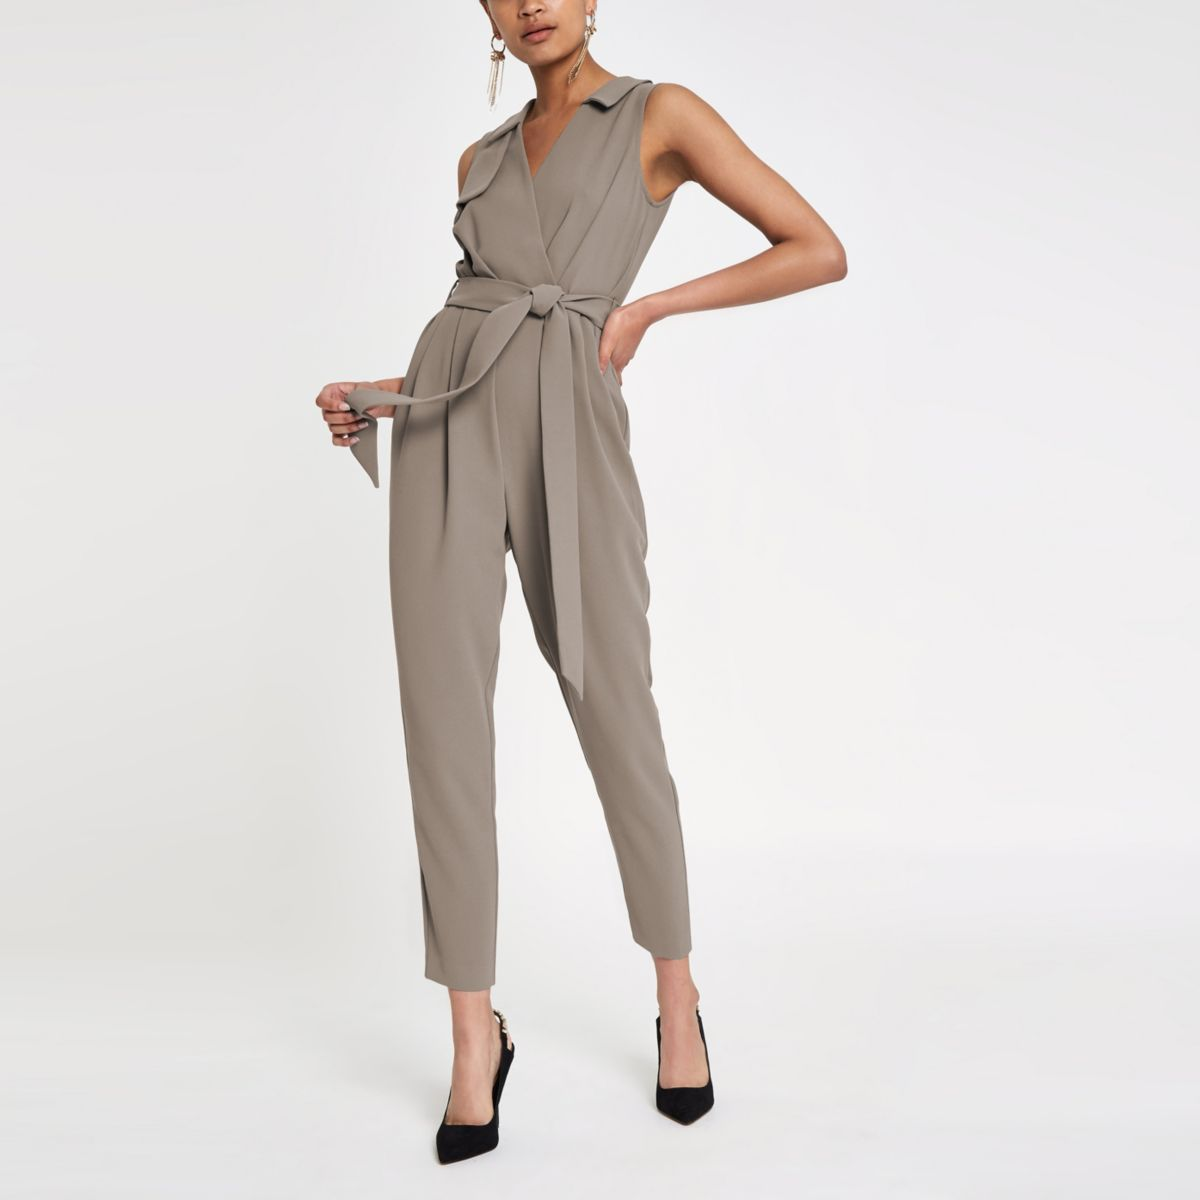 Grijze mouwloze tailored jumpsuit